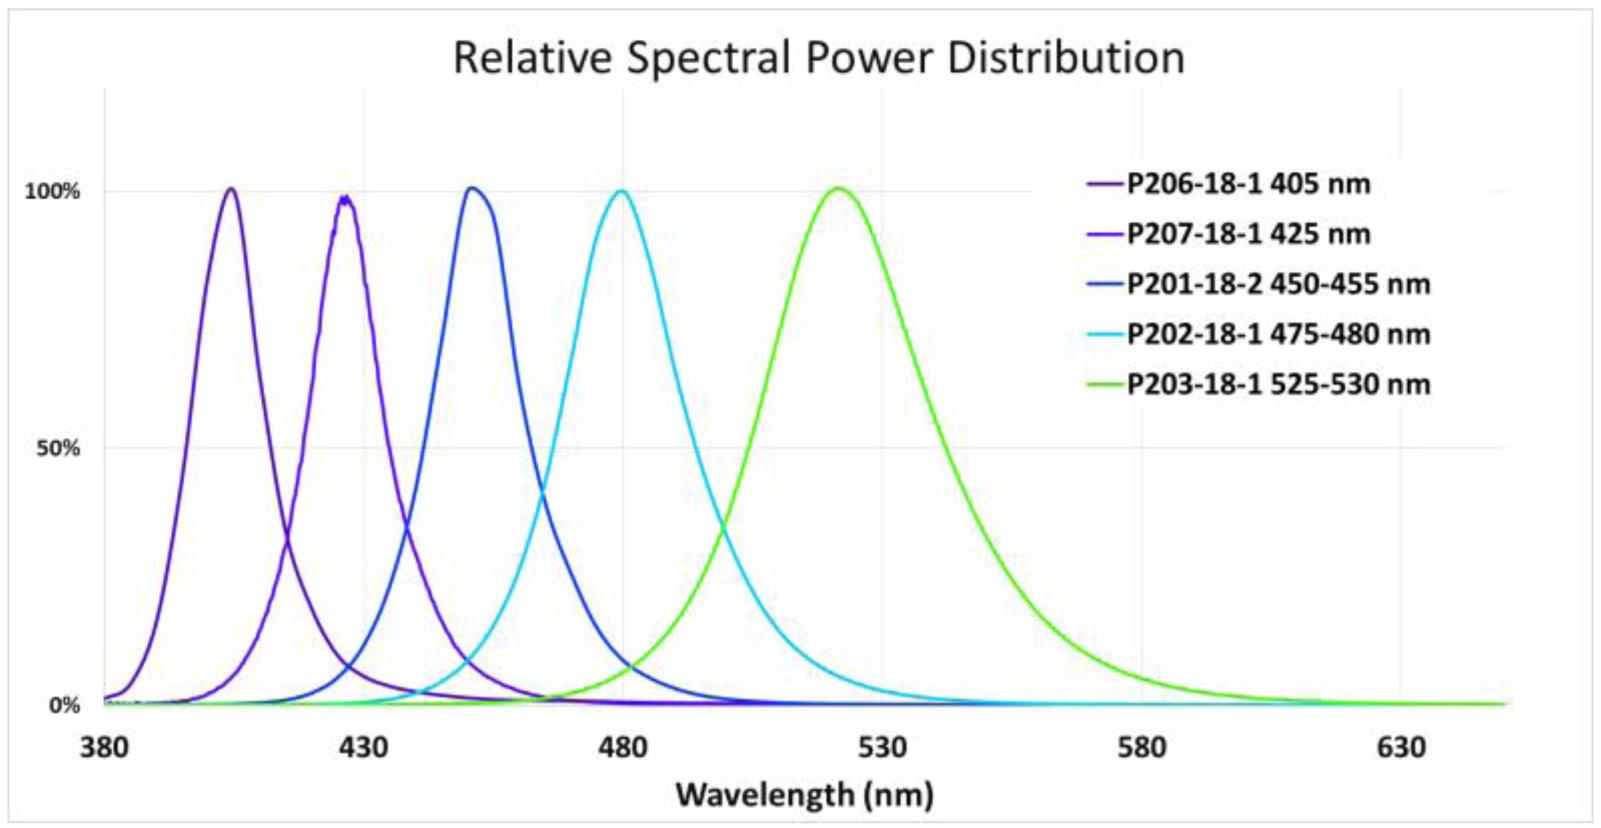 Relative_Spectral_Power_Distribution_Hepatochem_Interchim_1018